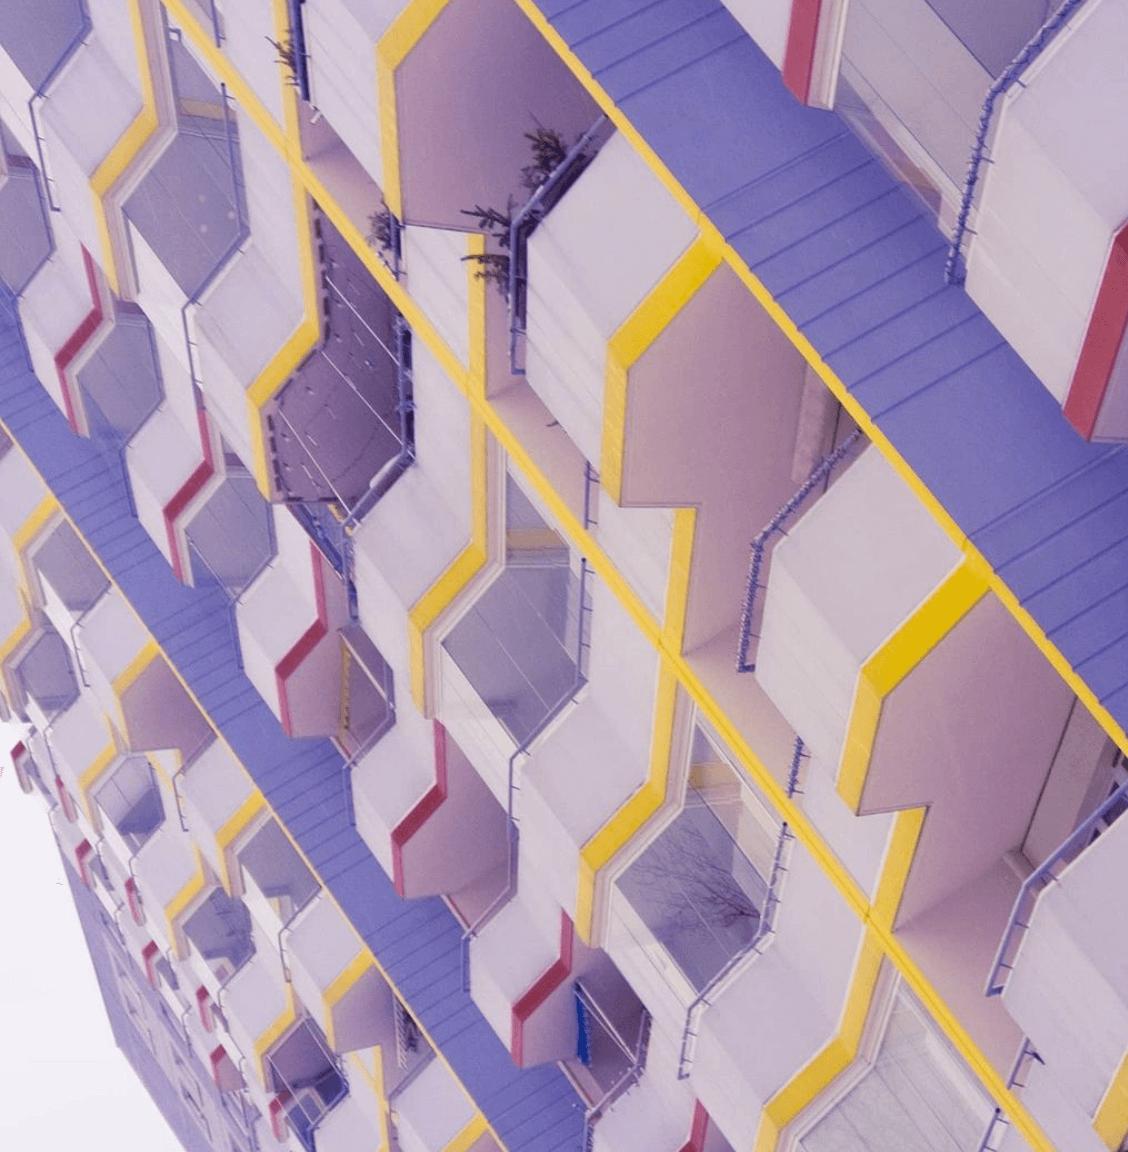 colourful berlin apartment, balconies